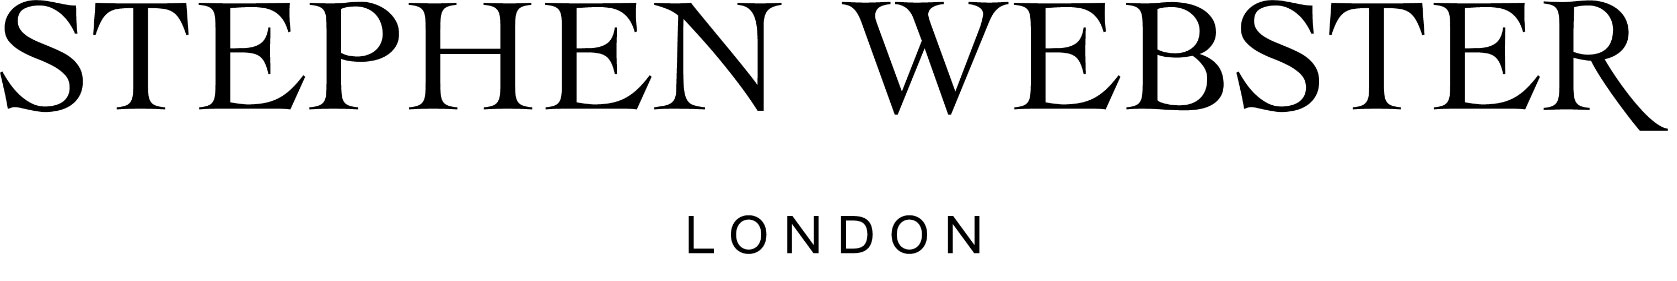 Stephen-Webster-logo.jpg